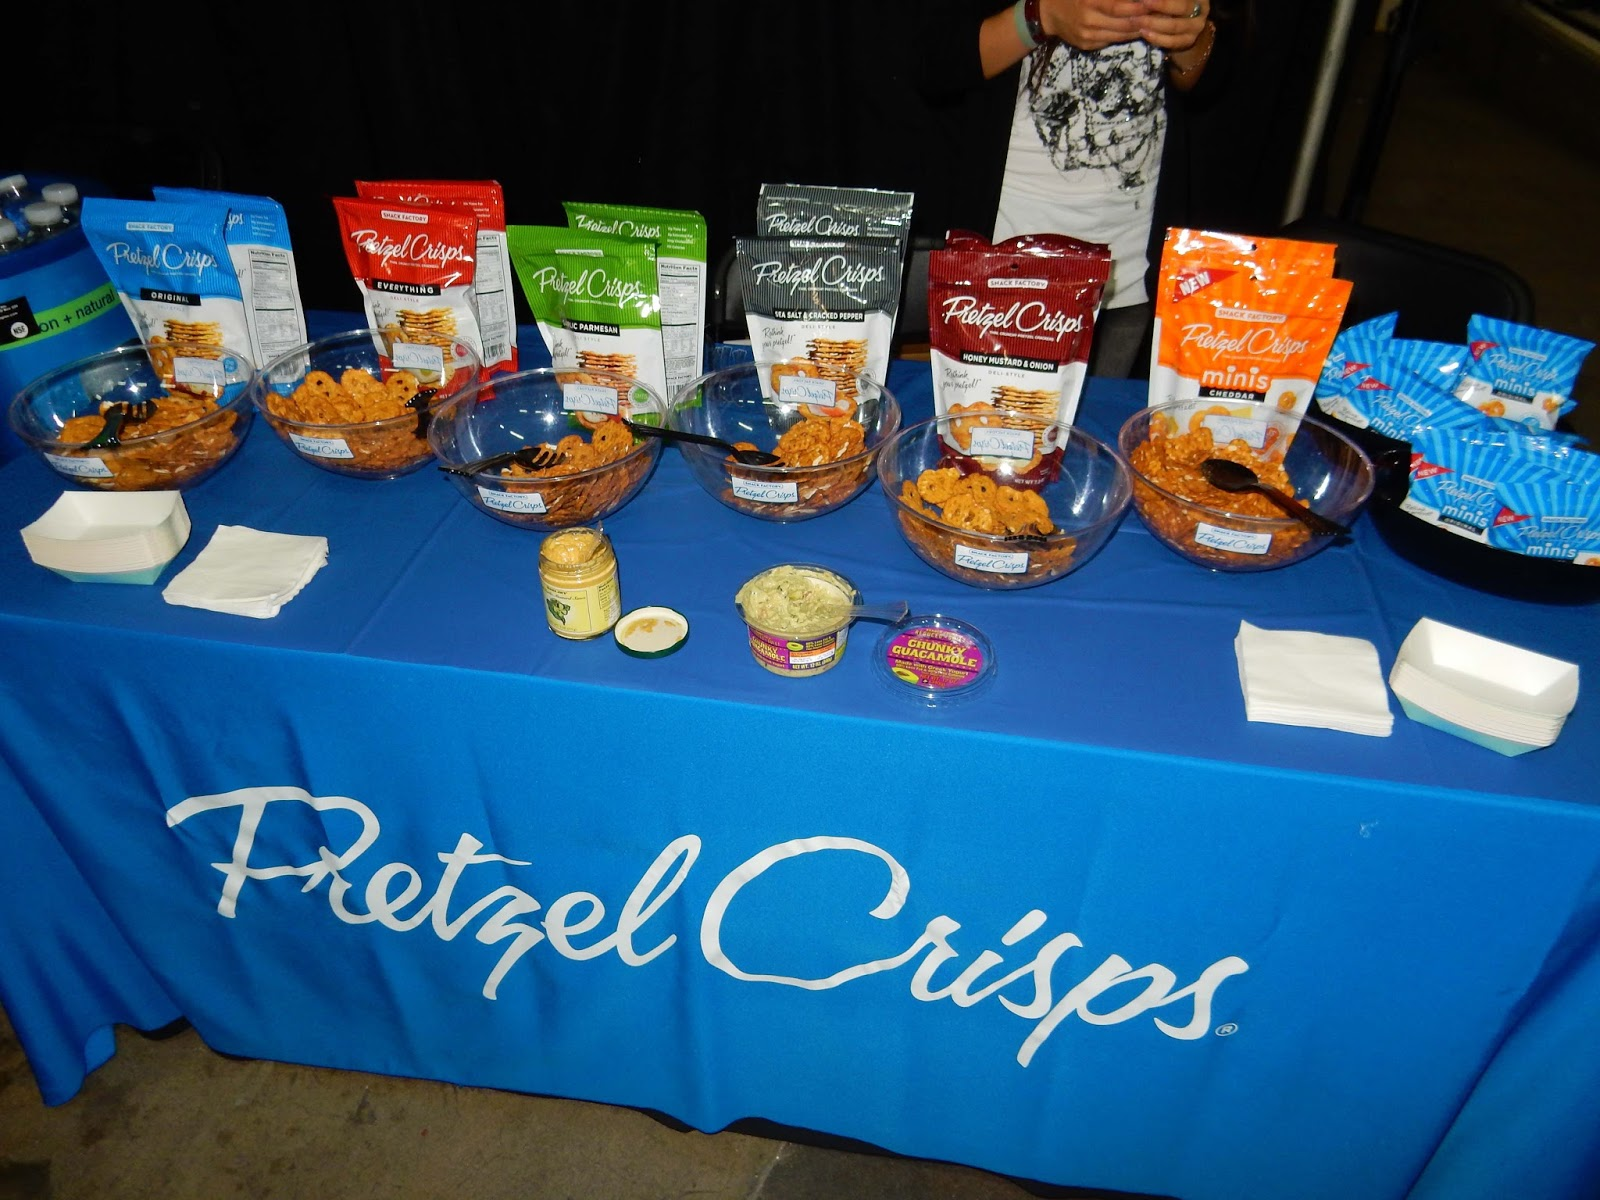 Gilt Los Angeles Shopping event pretzel chips